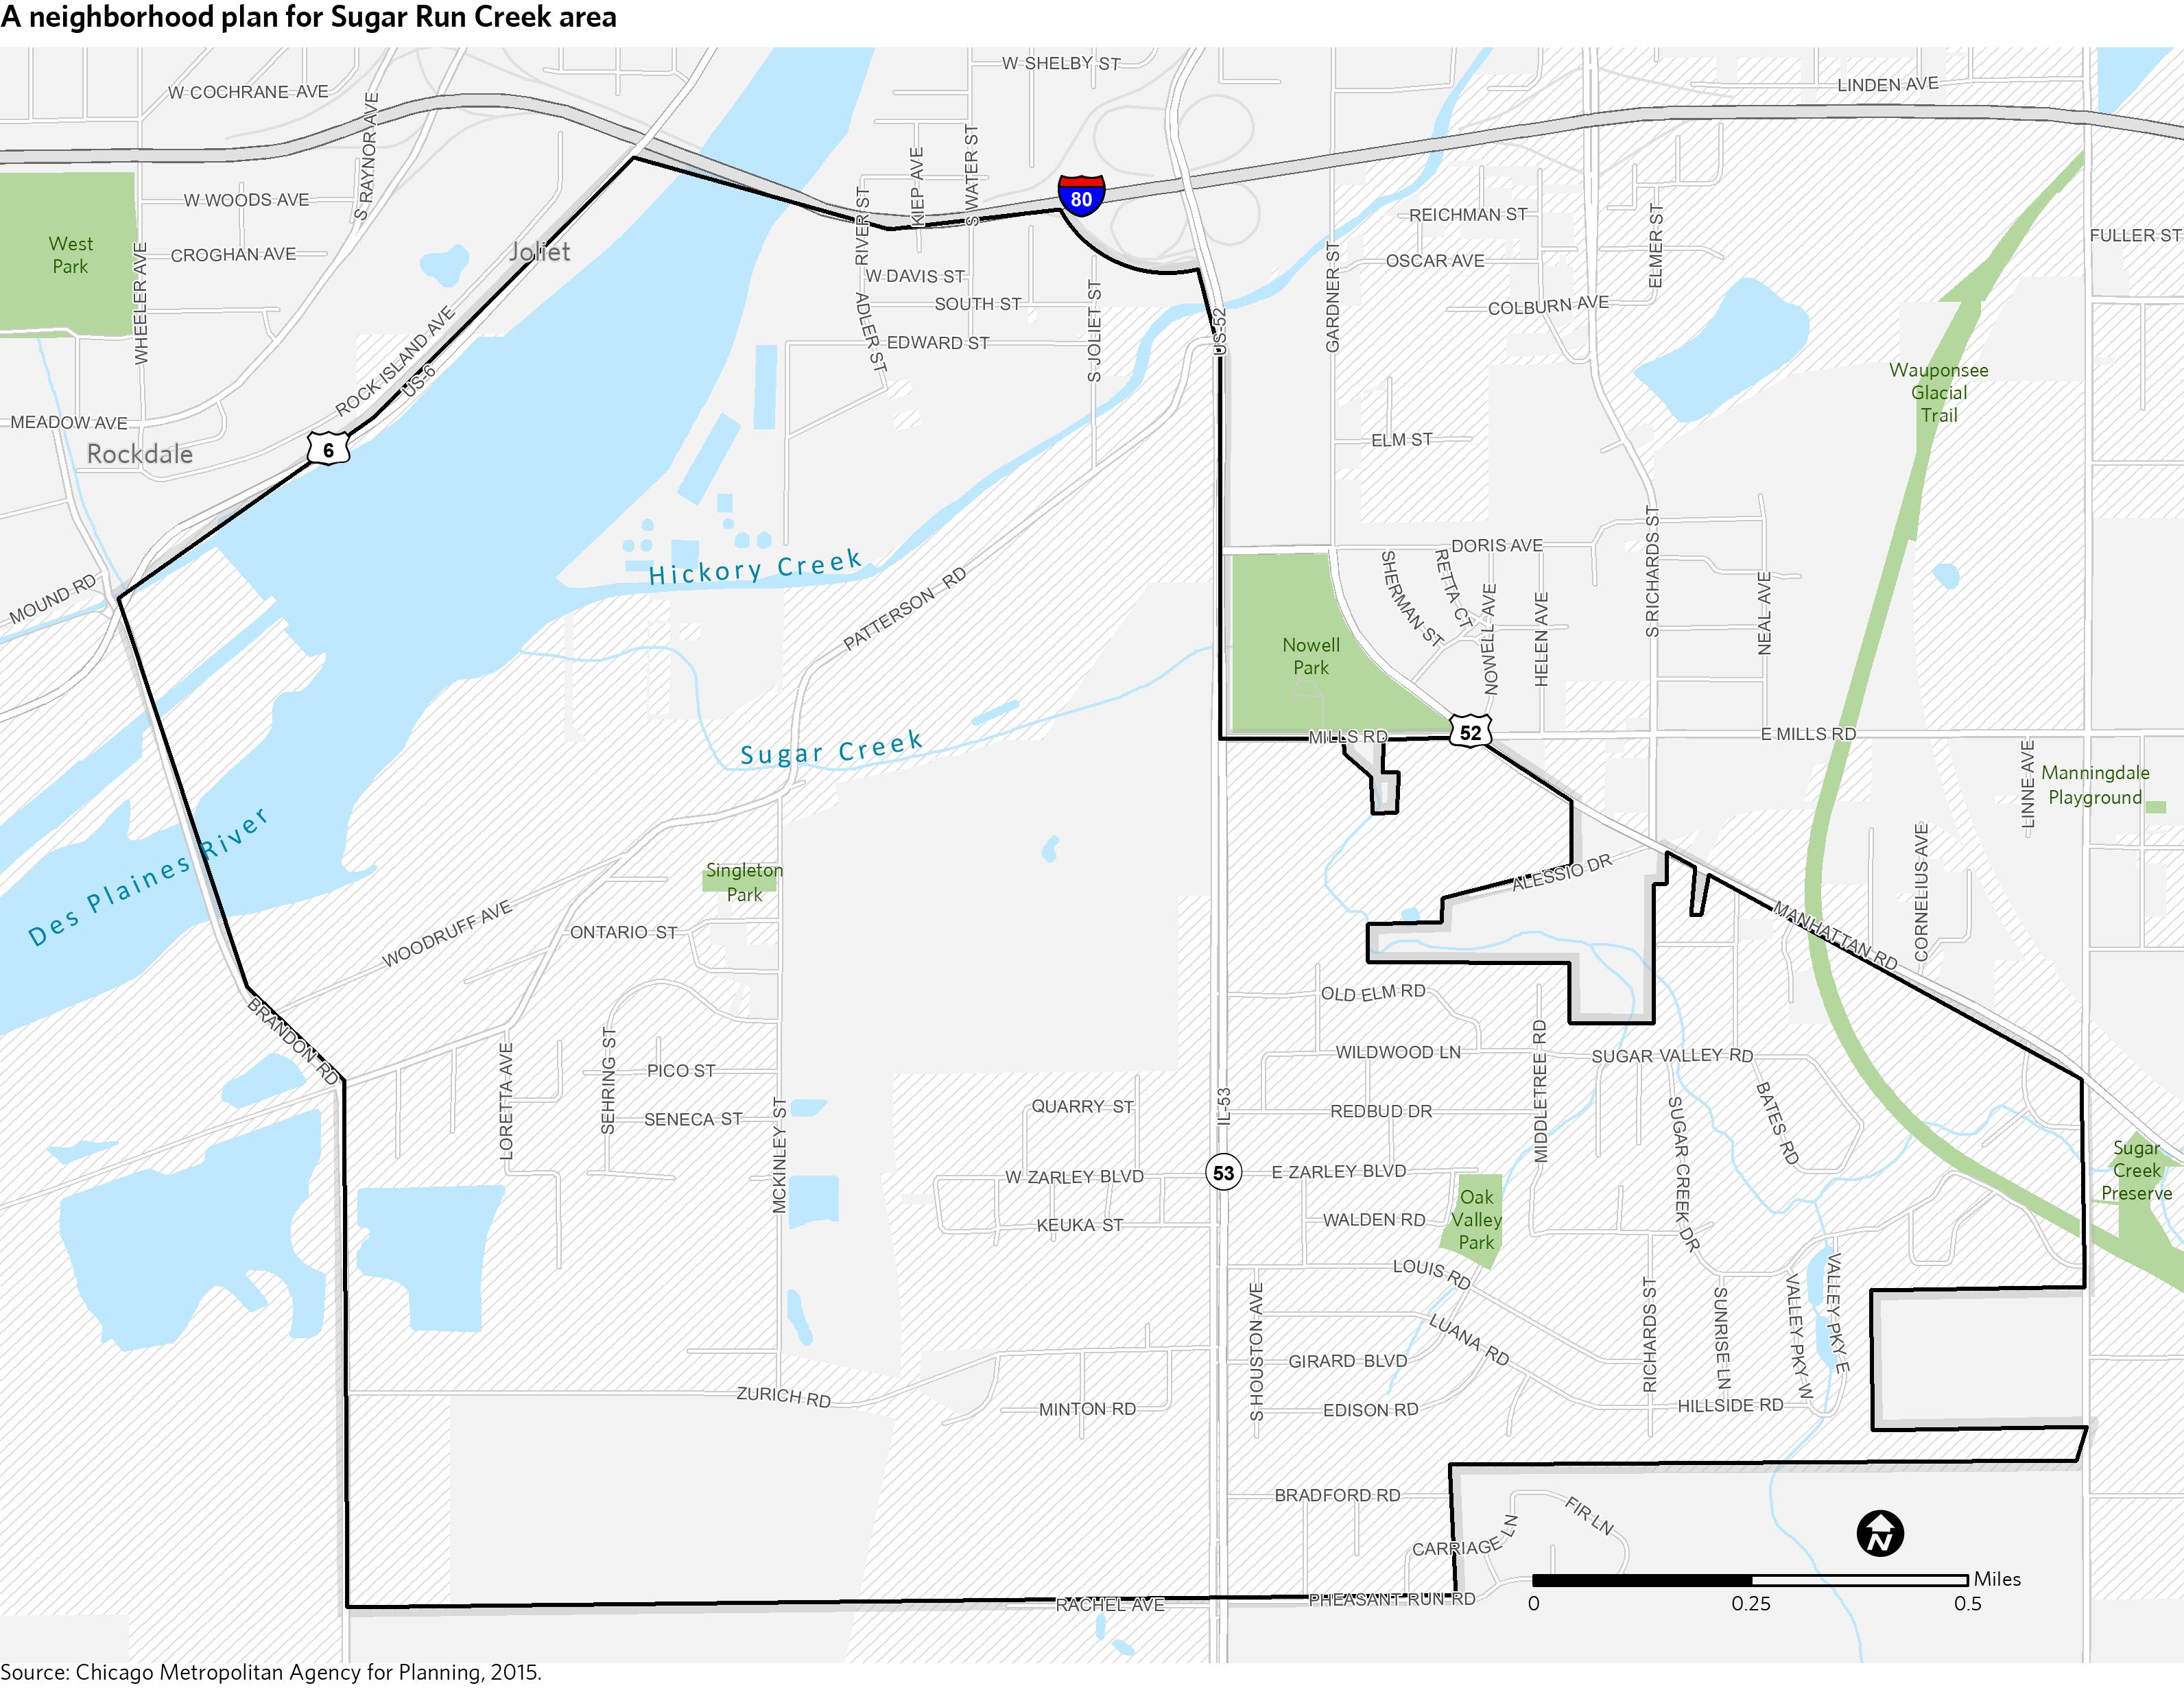 Will County - CMAP on illinois map bloomington il, illinois map with all cities, illinois state road map, illinois house district map, illinois cities and towns, illinois map with rivers, illinois road map detailed, illinois elevation map, illinois interstate map, illinois airports map, illinois town map, illinois 294 toll road map,